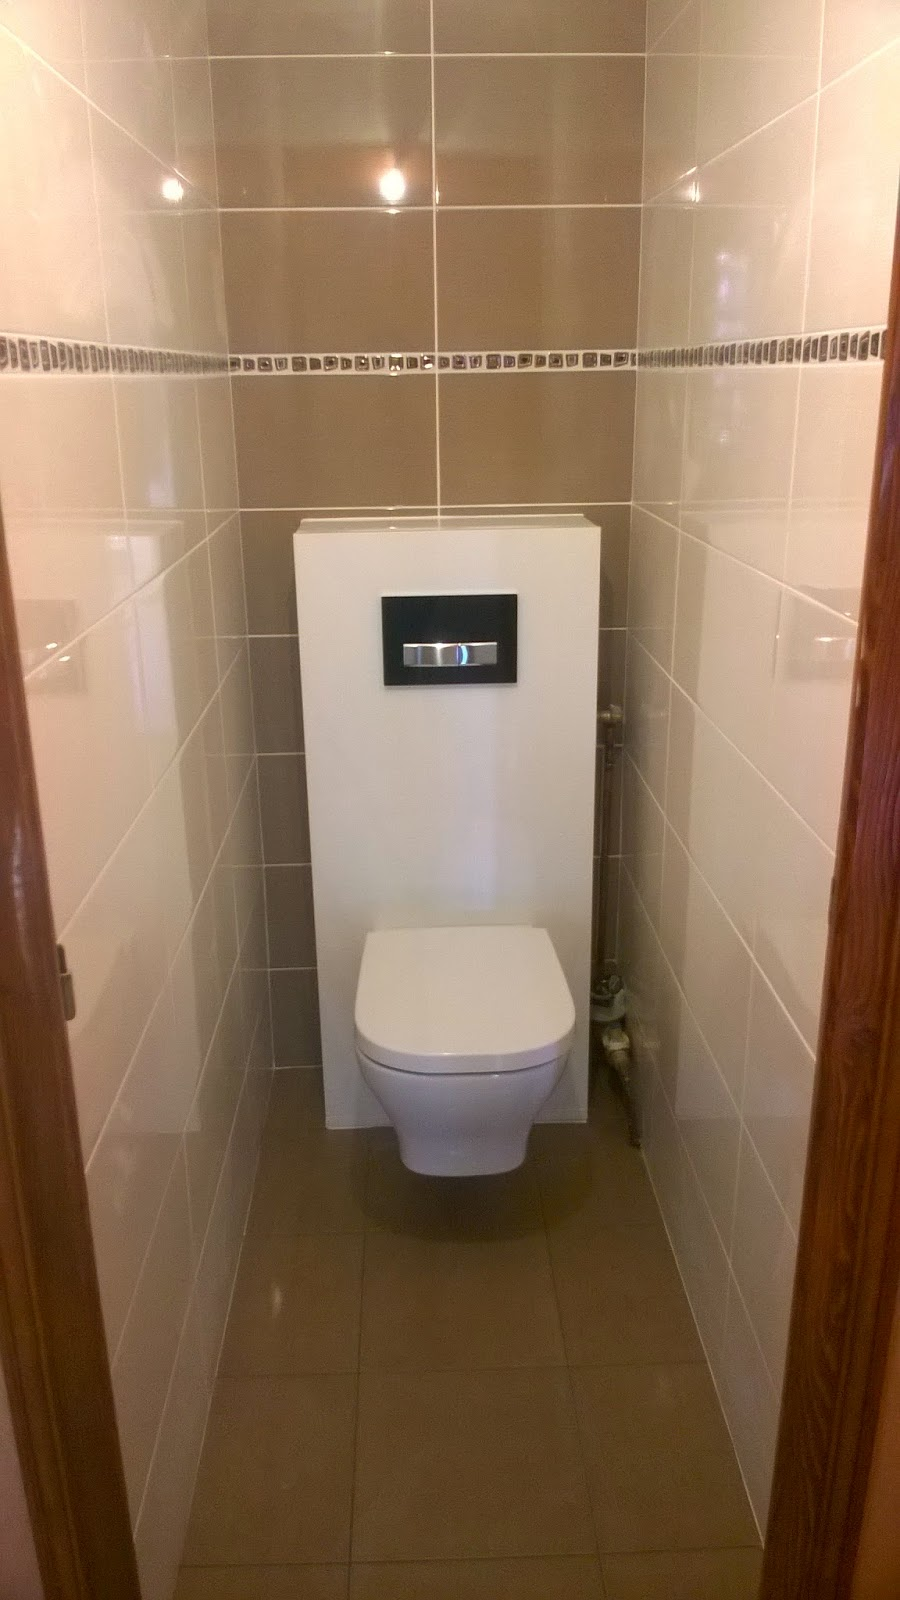 Faience salle de bain taupe for Carrelage toilette